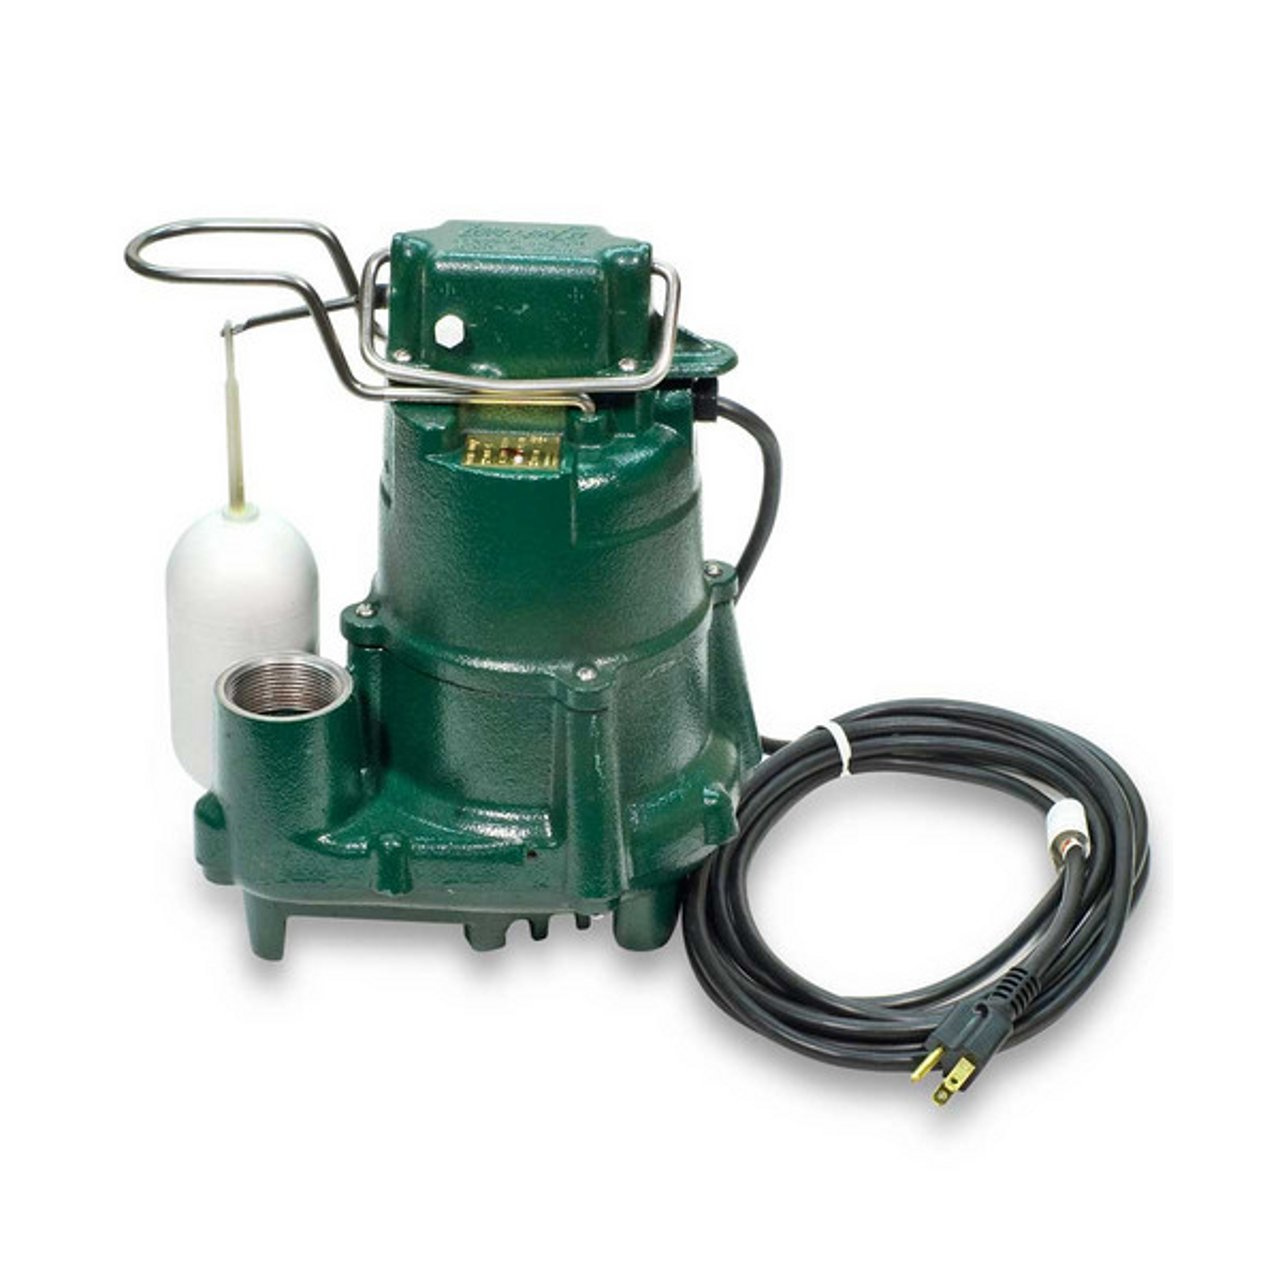 Zoeller 98-0001 115-Volt 1/2 Horse Power Model M98 Flow-Mate Automatic Cast Iron Single Phase Submersible Sump/Effluent Pump ... by Zoeller